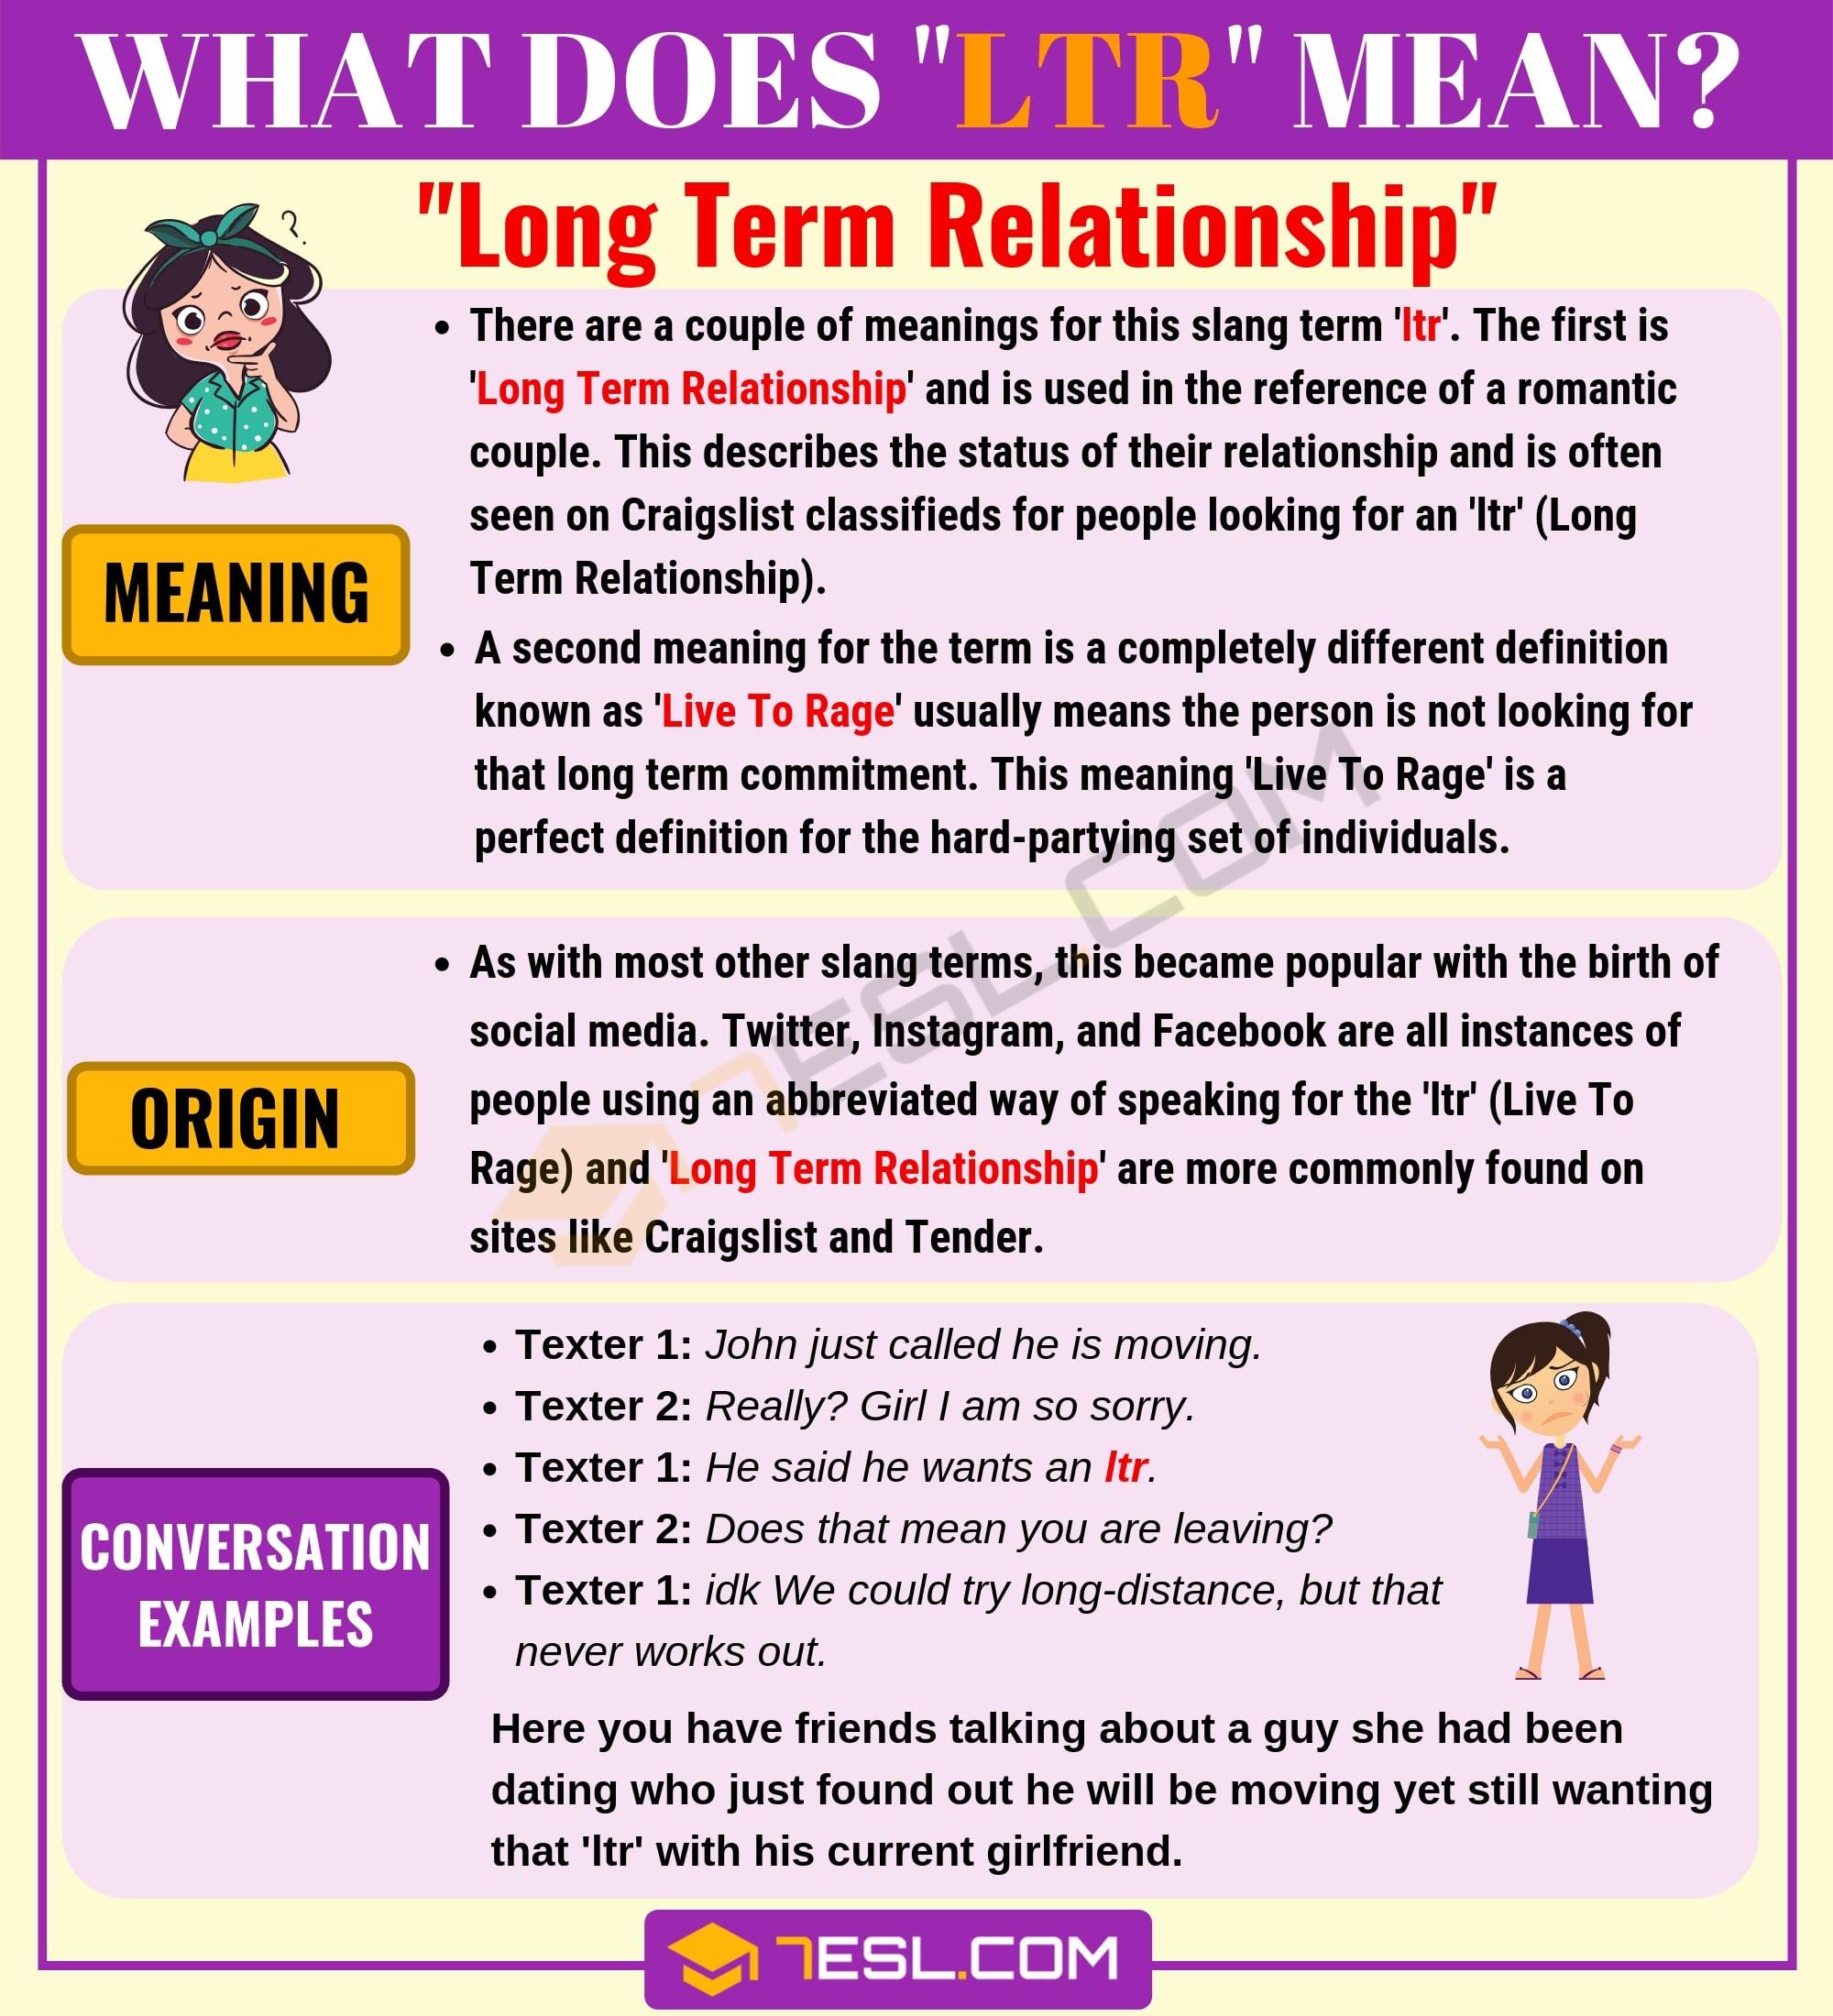 LTR dating sites